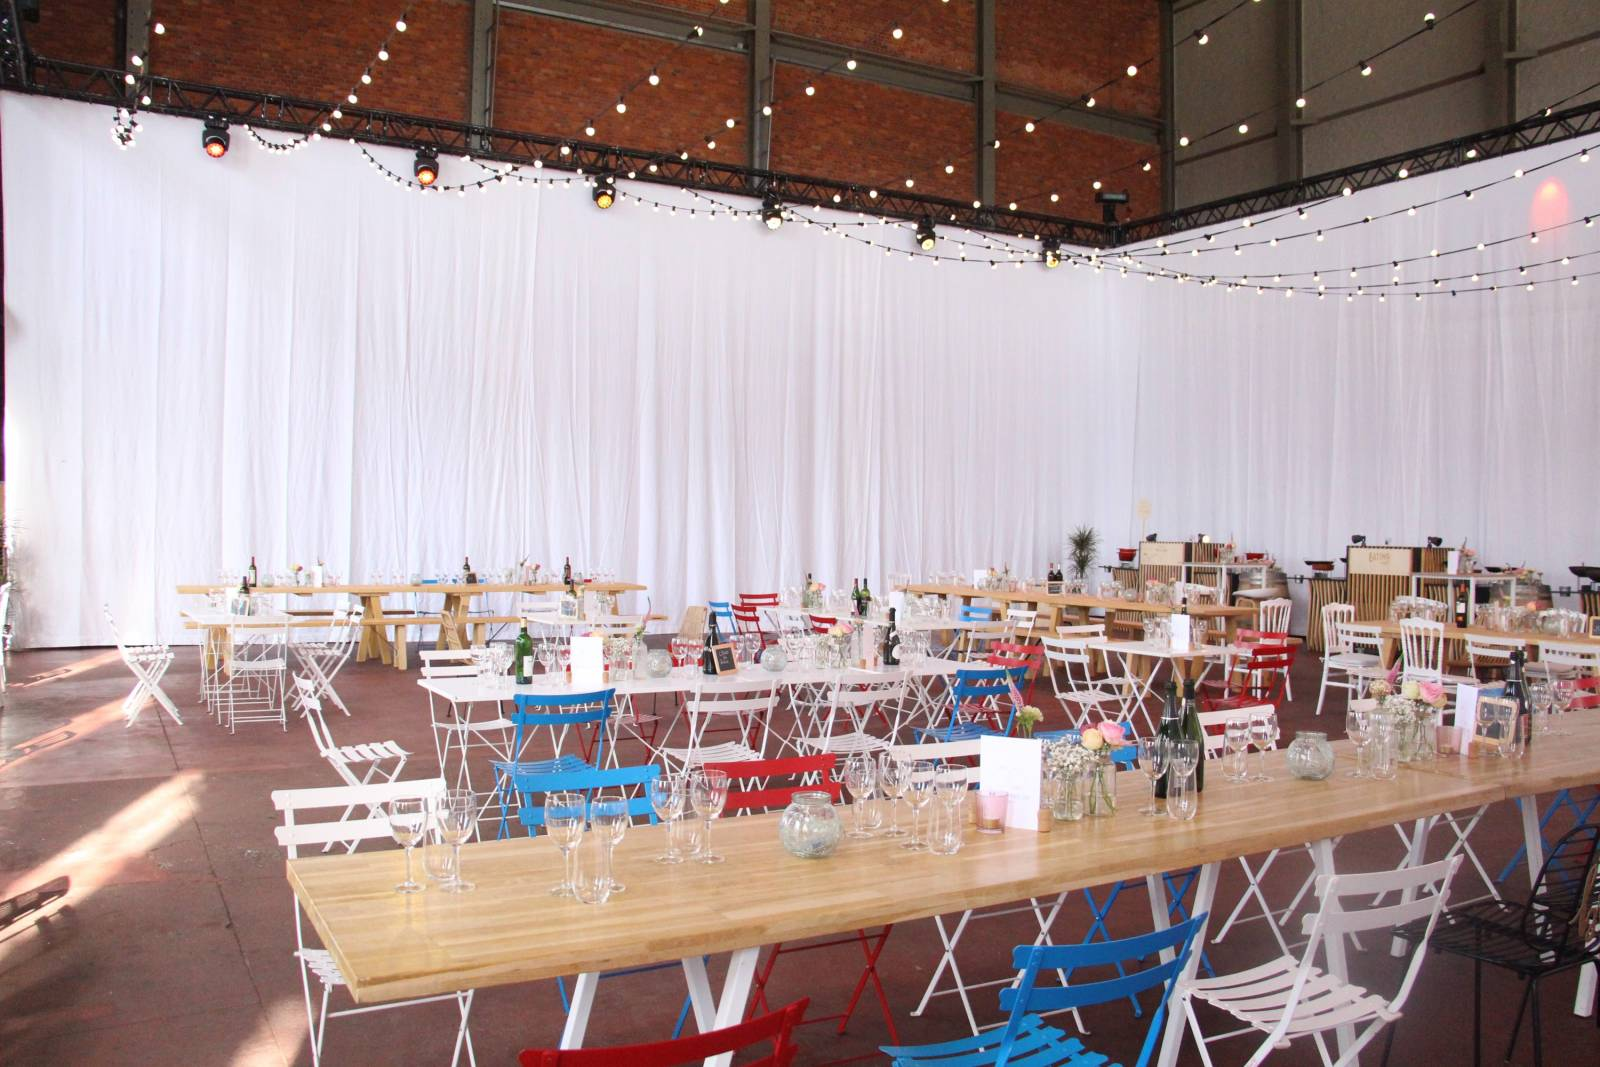 Hangar 43 - Feestzaal Oost-Vlaanderen - Industrieel - House of Weddings - 40